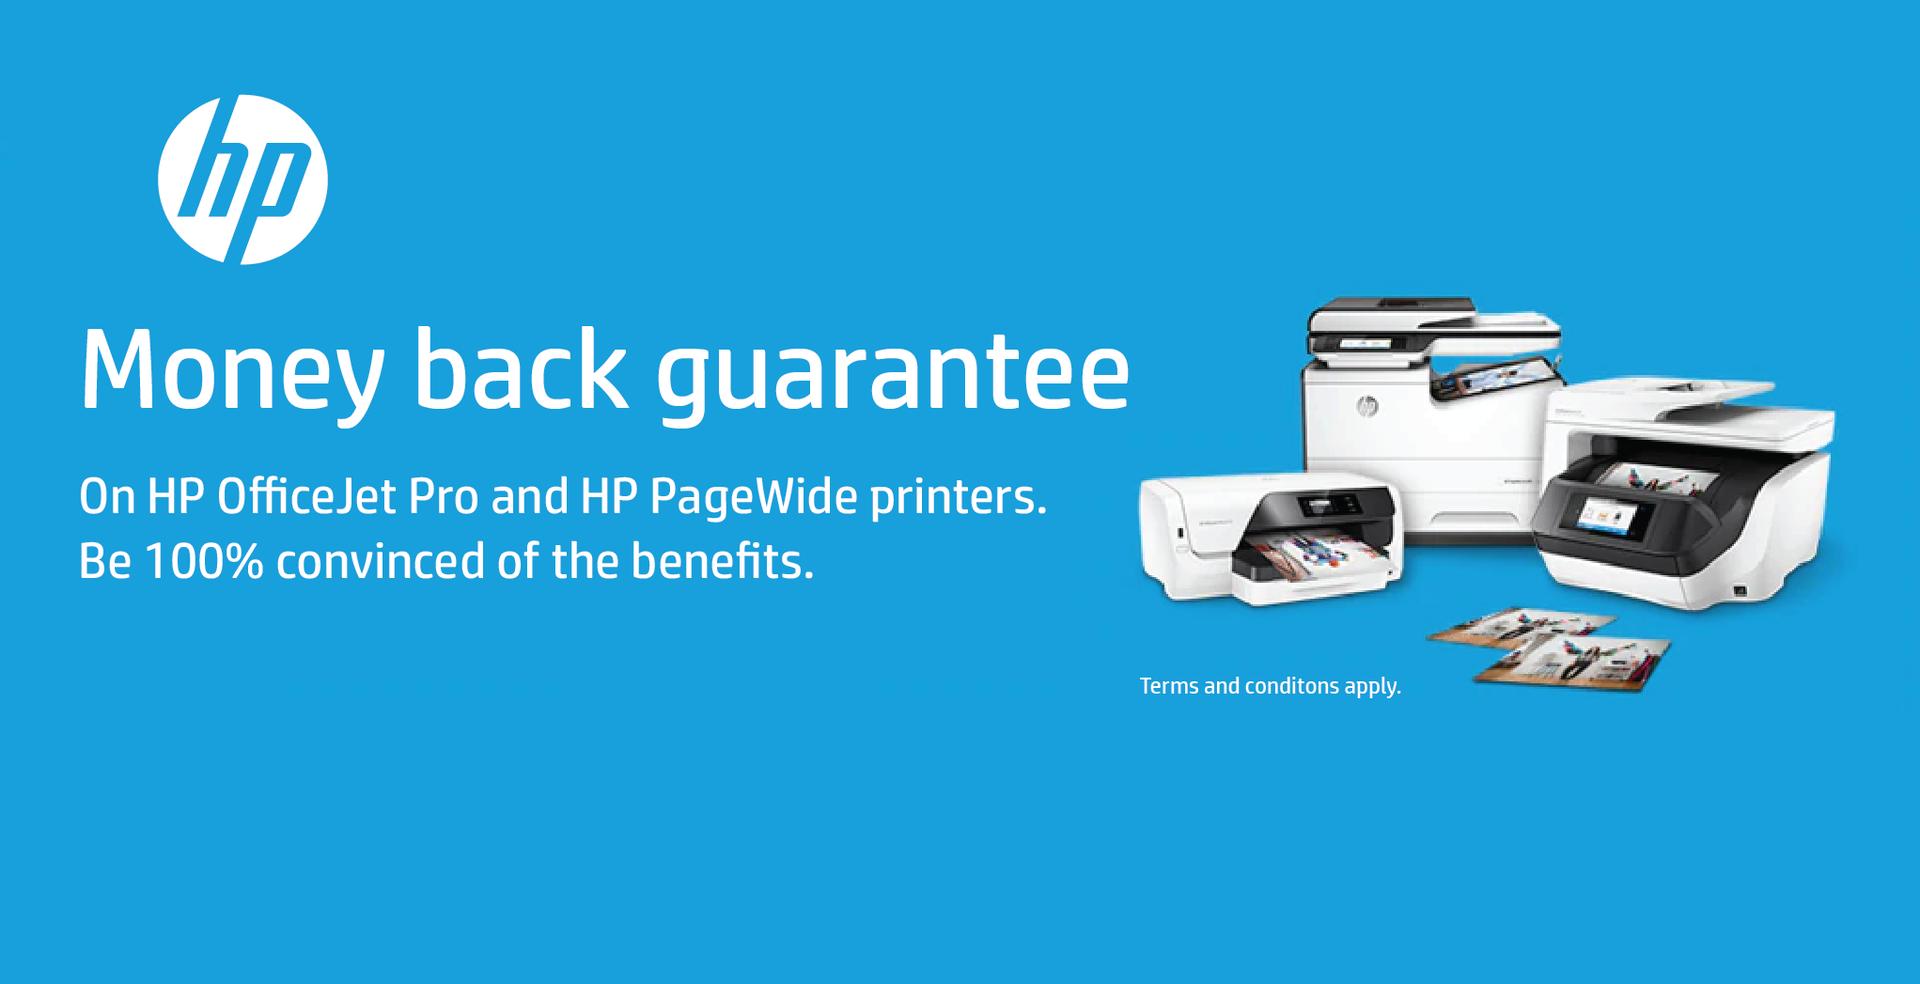 HP Money Back Guarantee